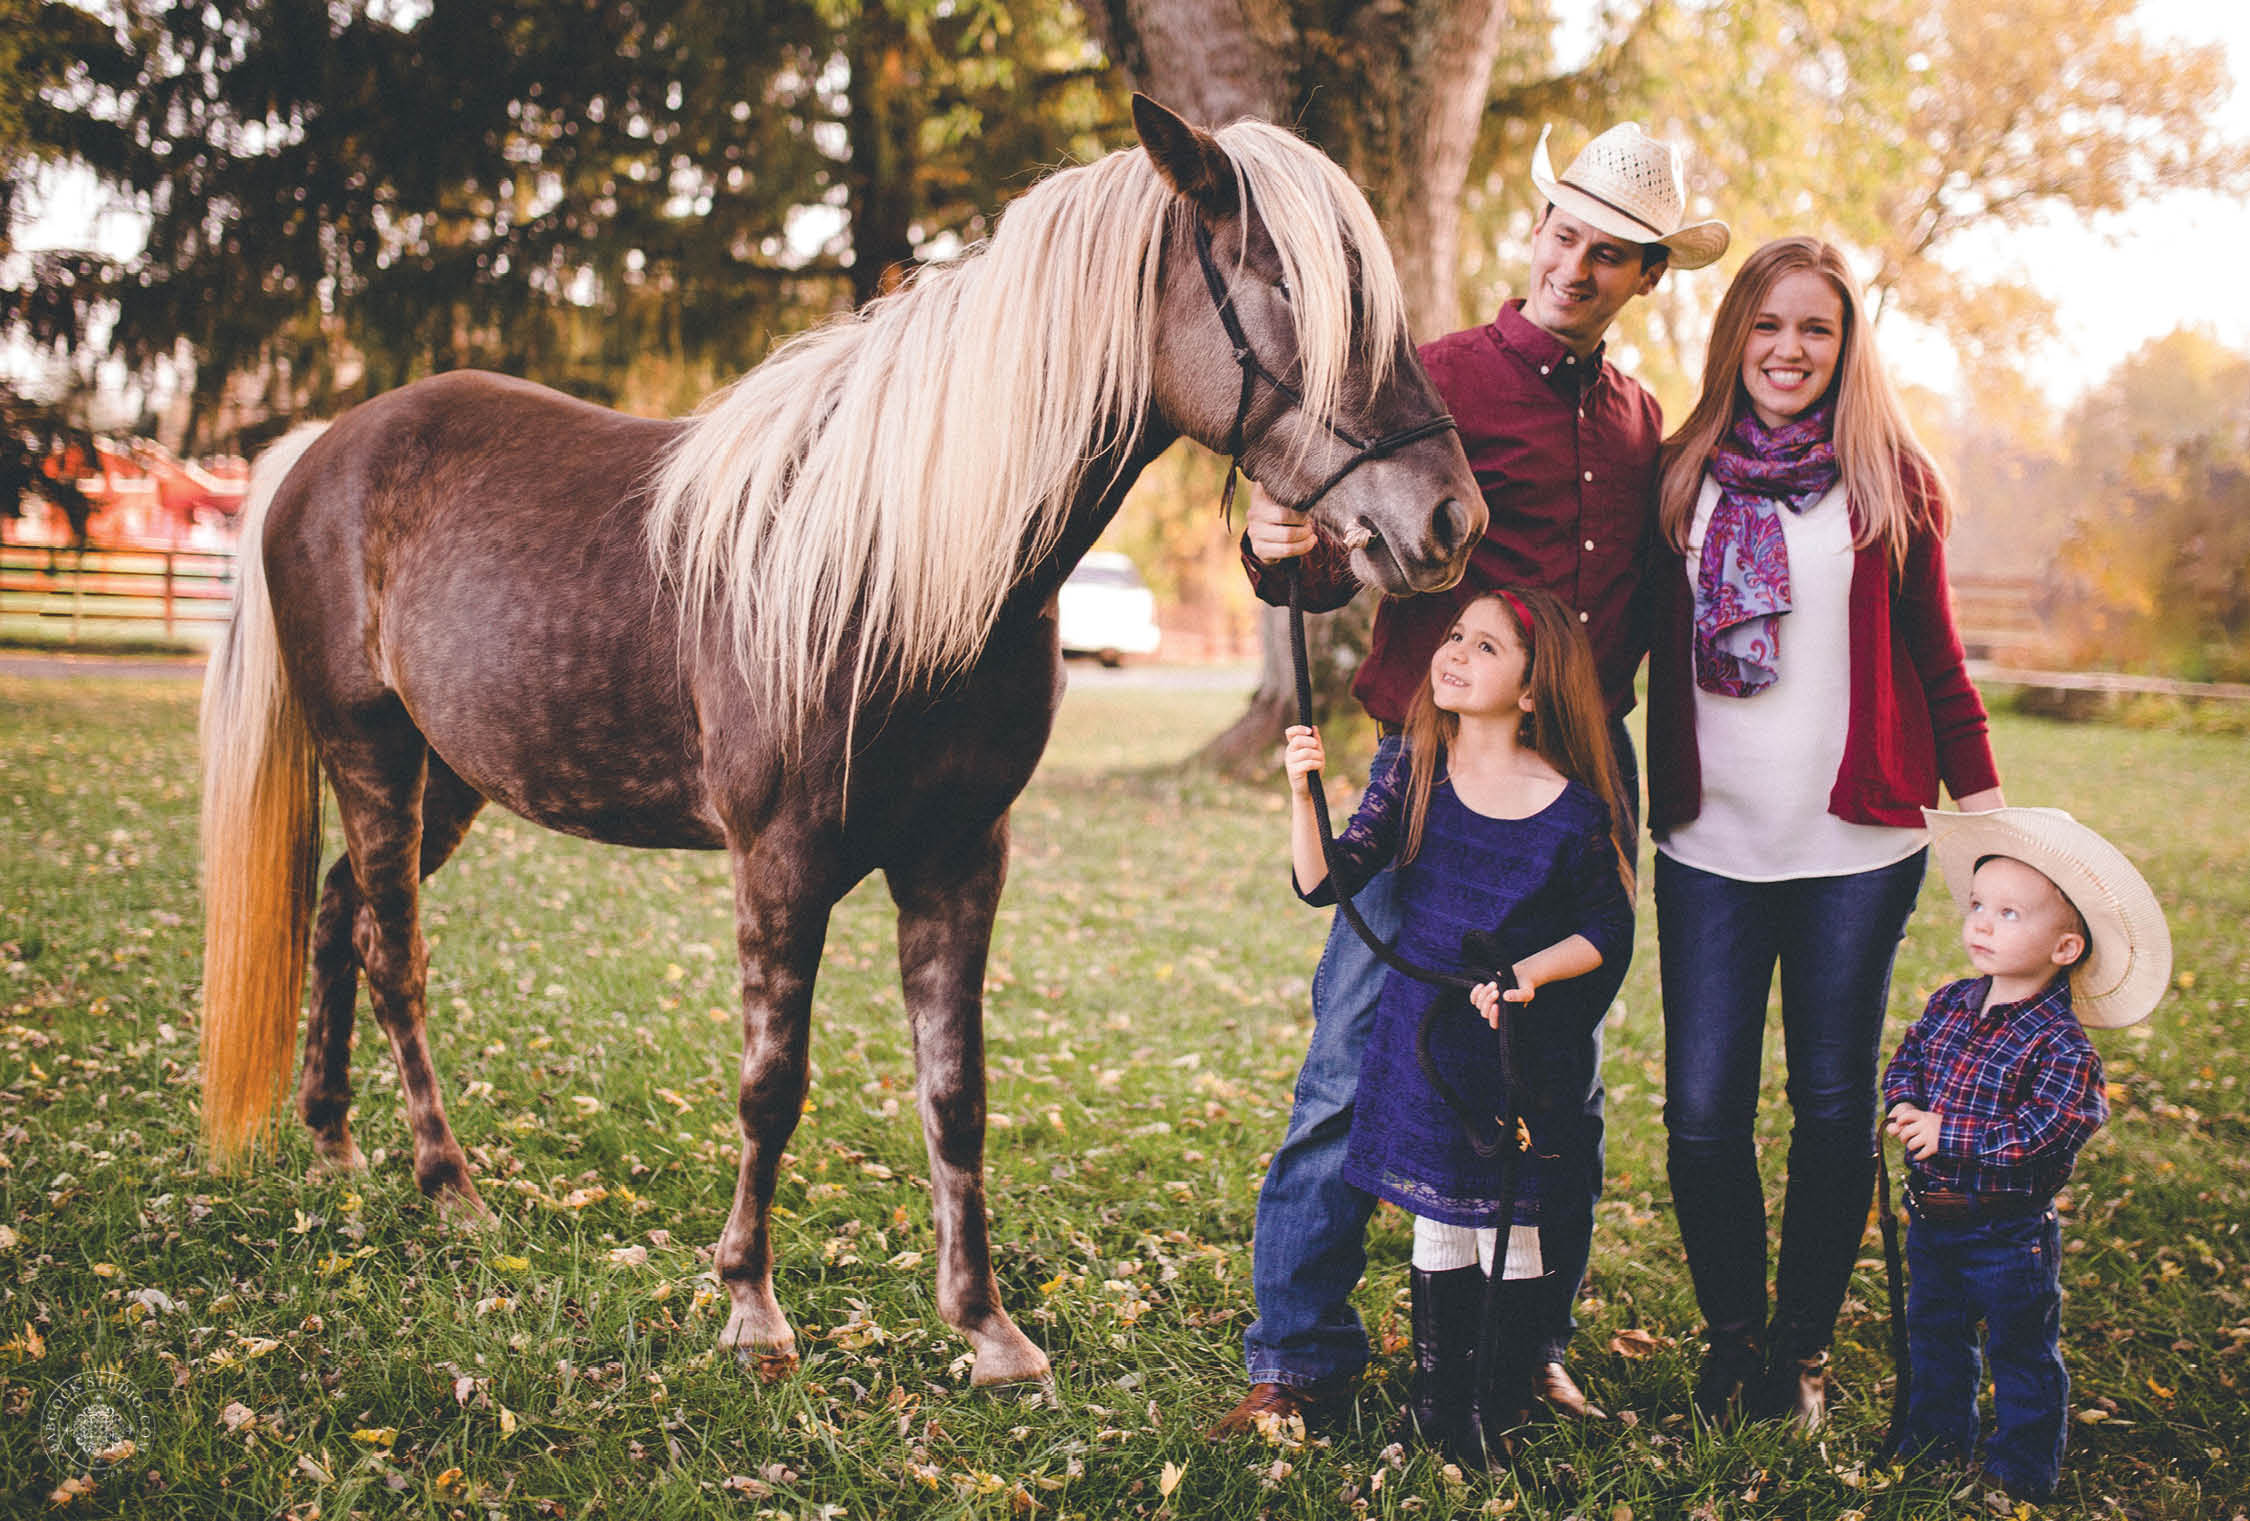 vance-family-children-photographer-dayton-ohio-12.jpg